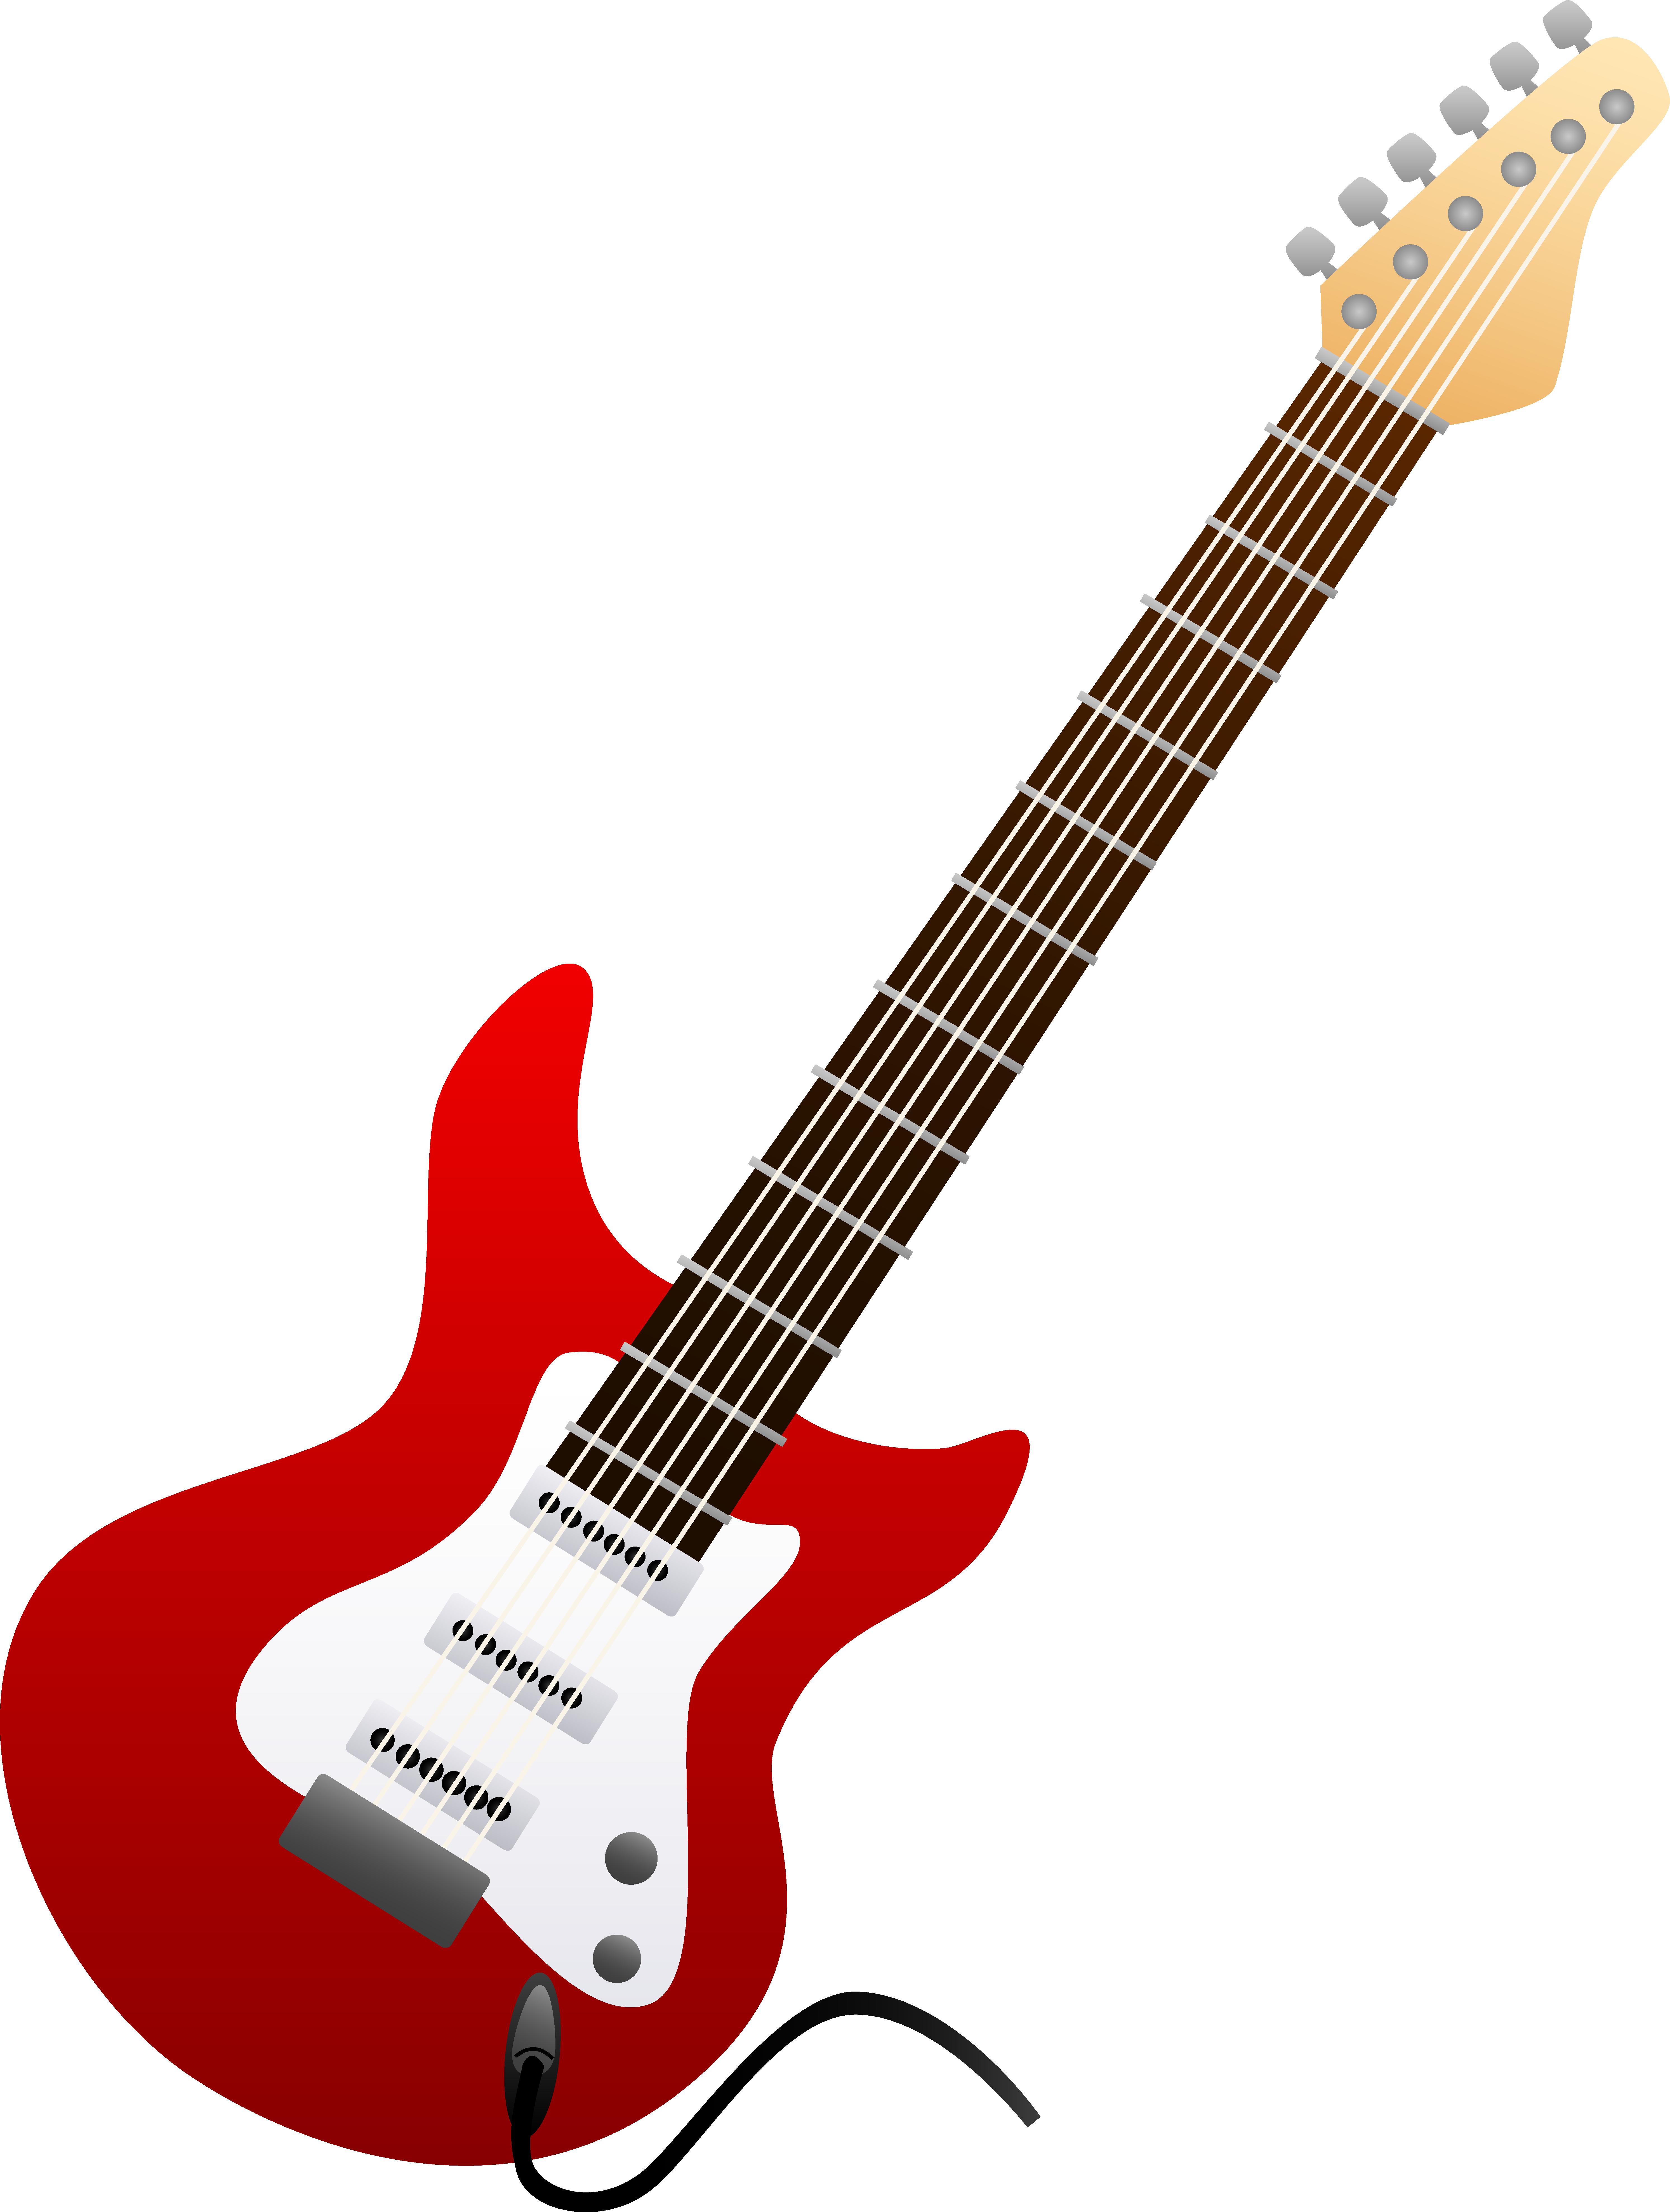 guitar clip art royalty free clipart panda free clipart images rh clipartpanda com free clipart guitar pick free guitar clipart black and white